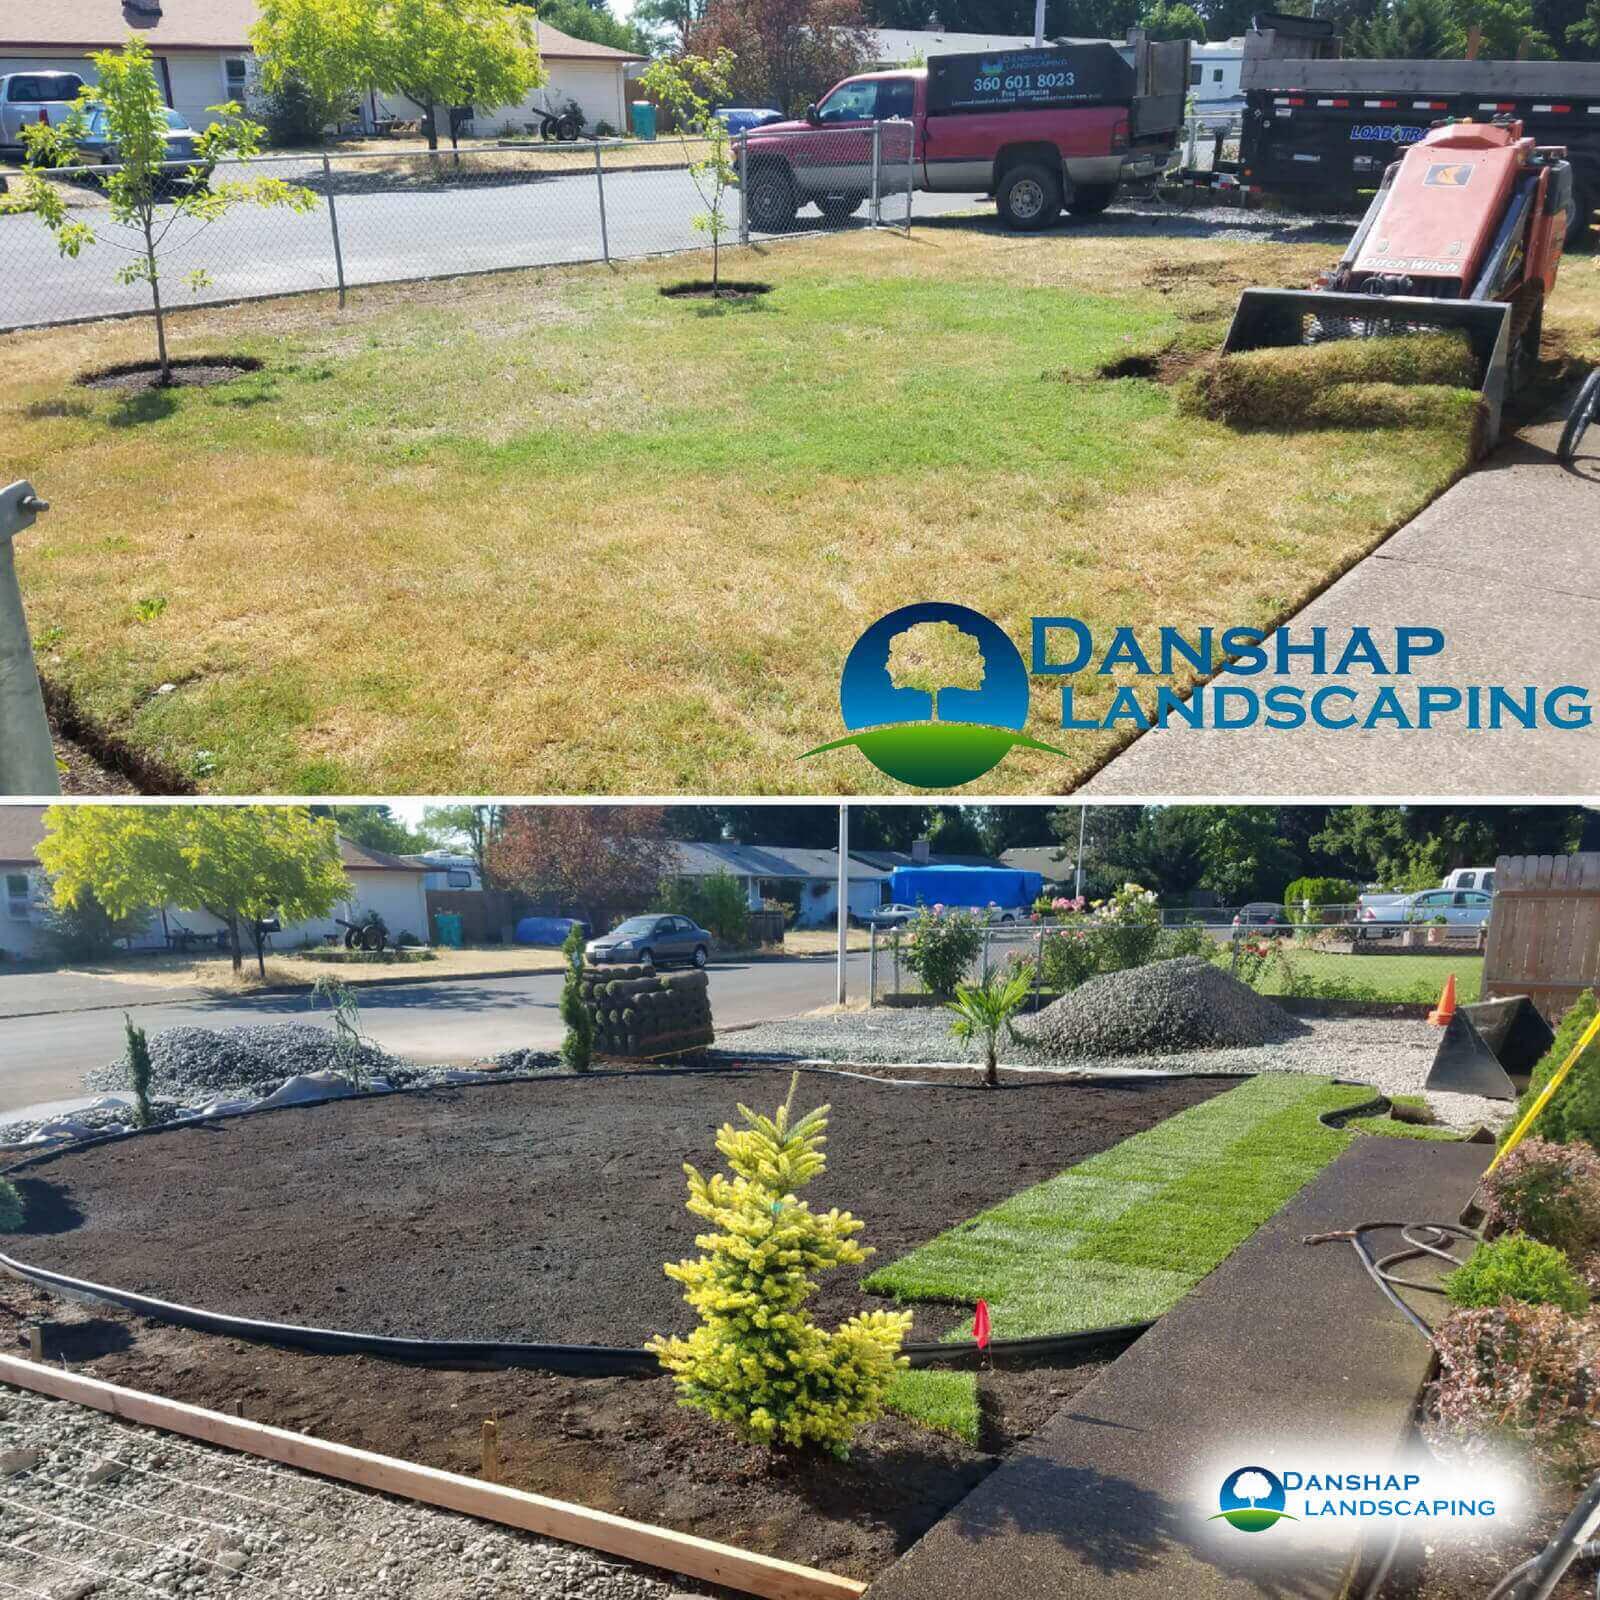 Landscaping-danshaplandscape-6